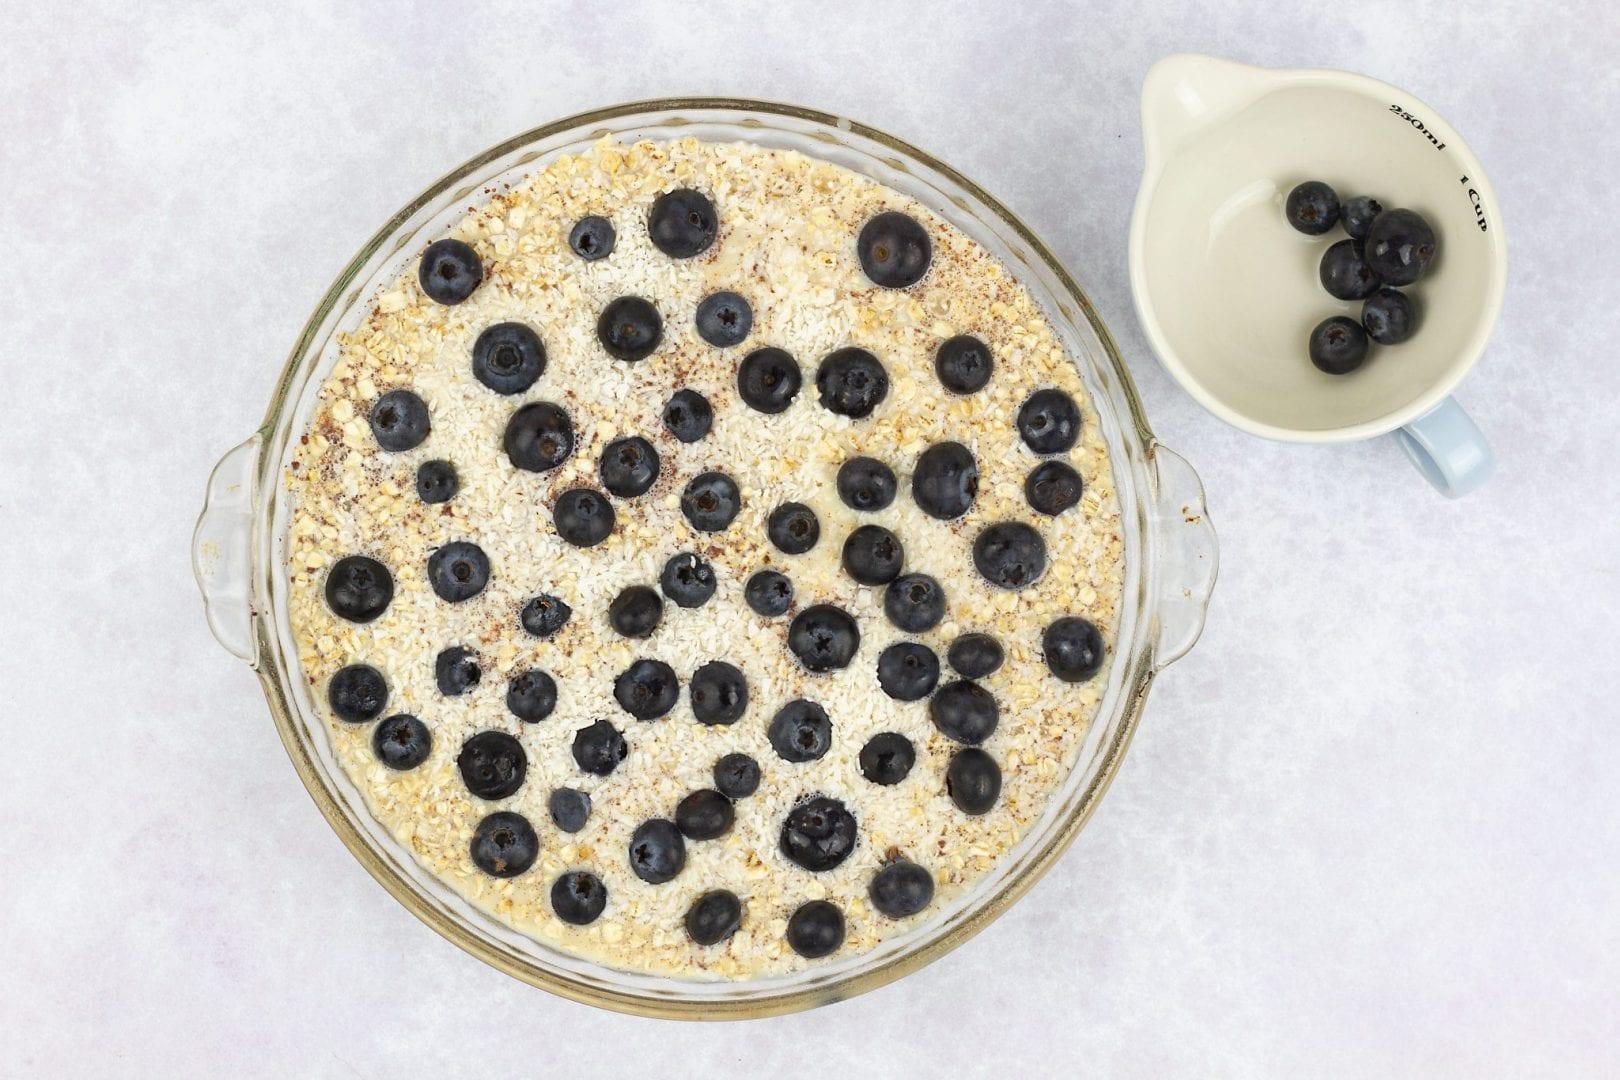 baked oats - porridge bake banana and blueberries - healthy breakfast recipes